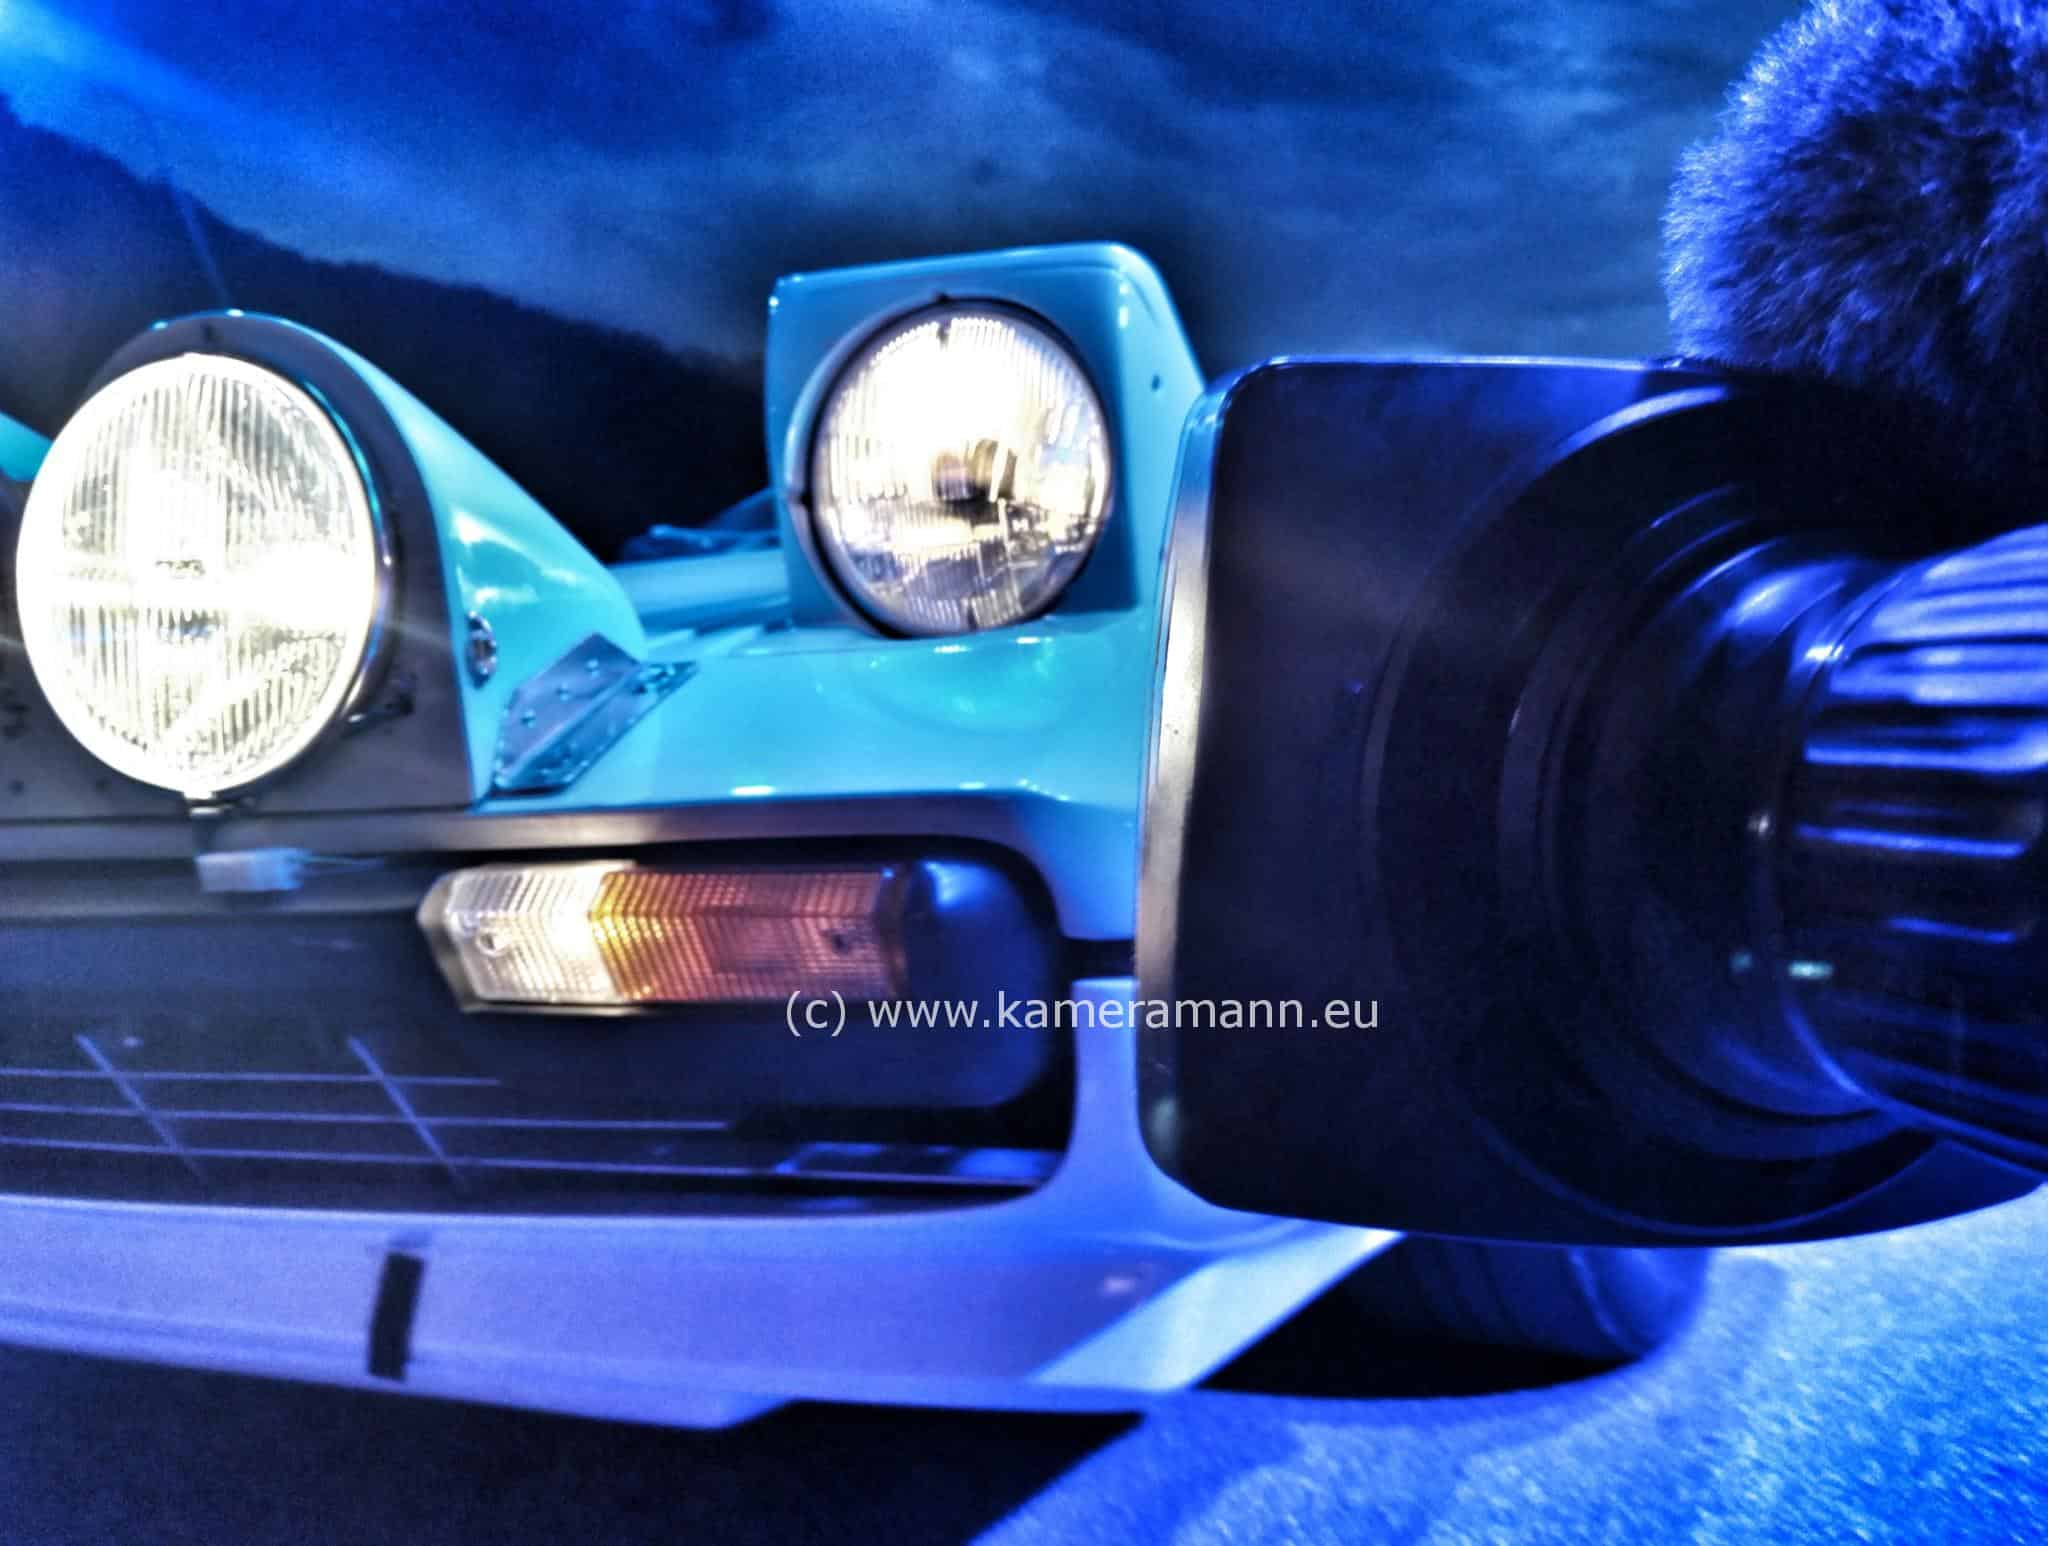 img gruppe b rallyelegenden saalfelden 213015 01 jpeg - Rallyelegenden Saalfelden